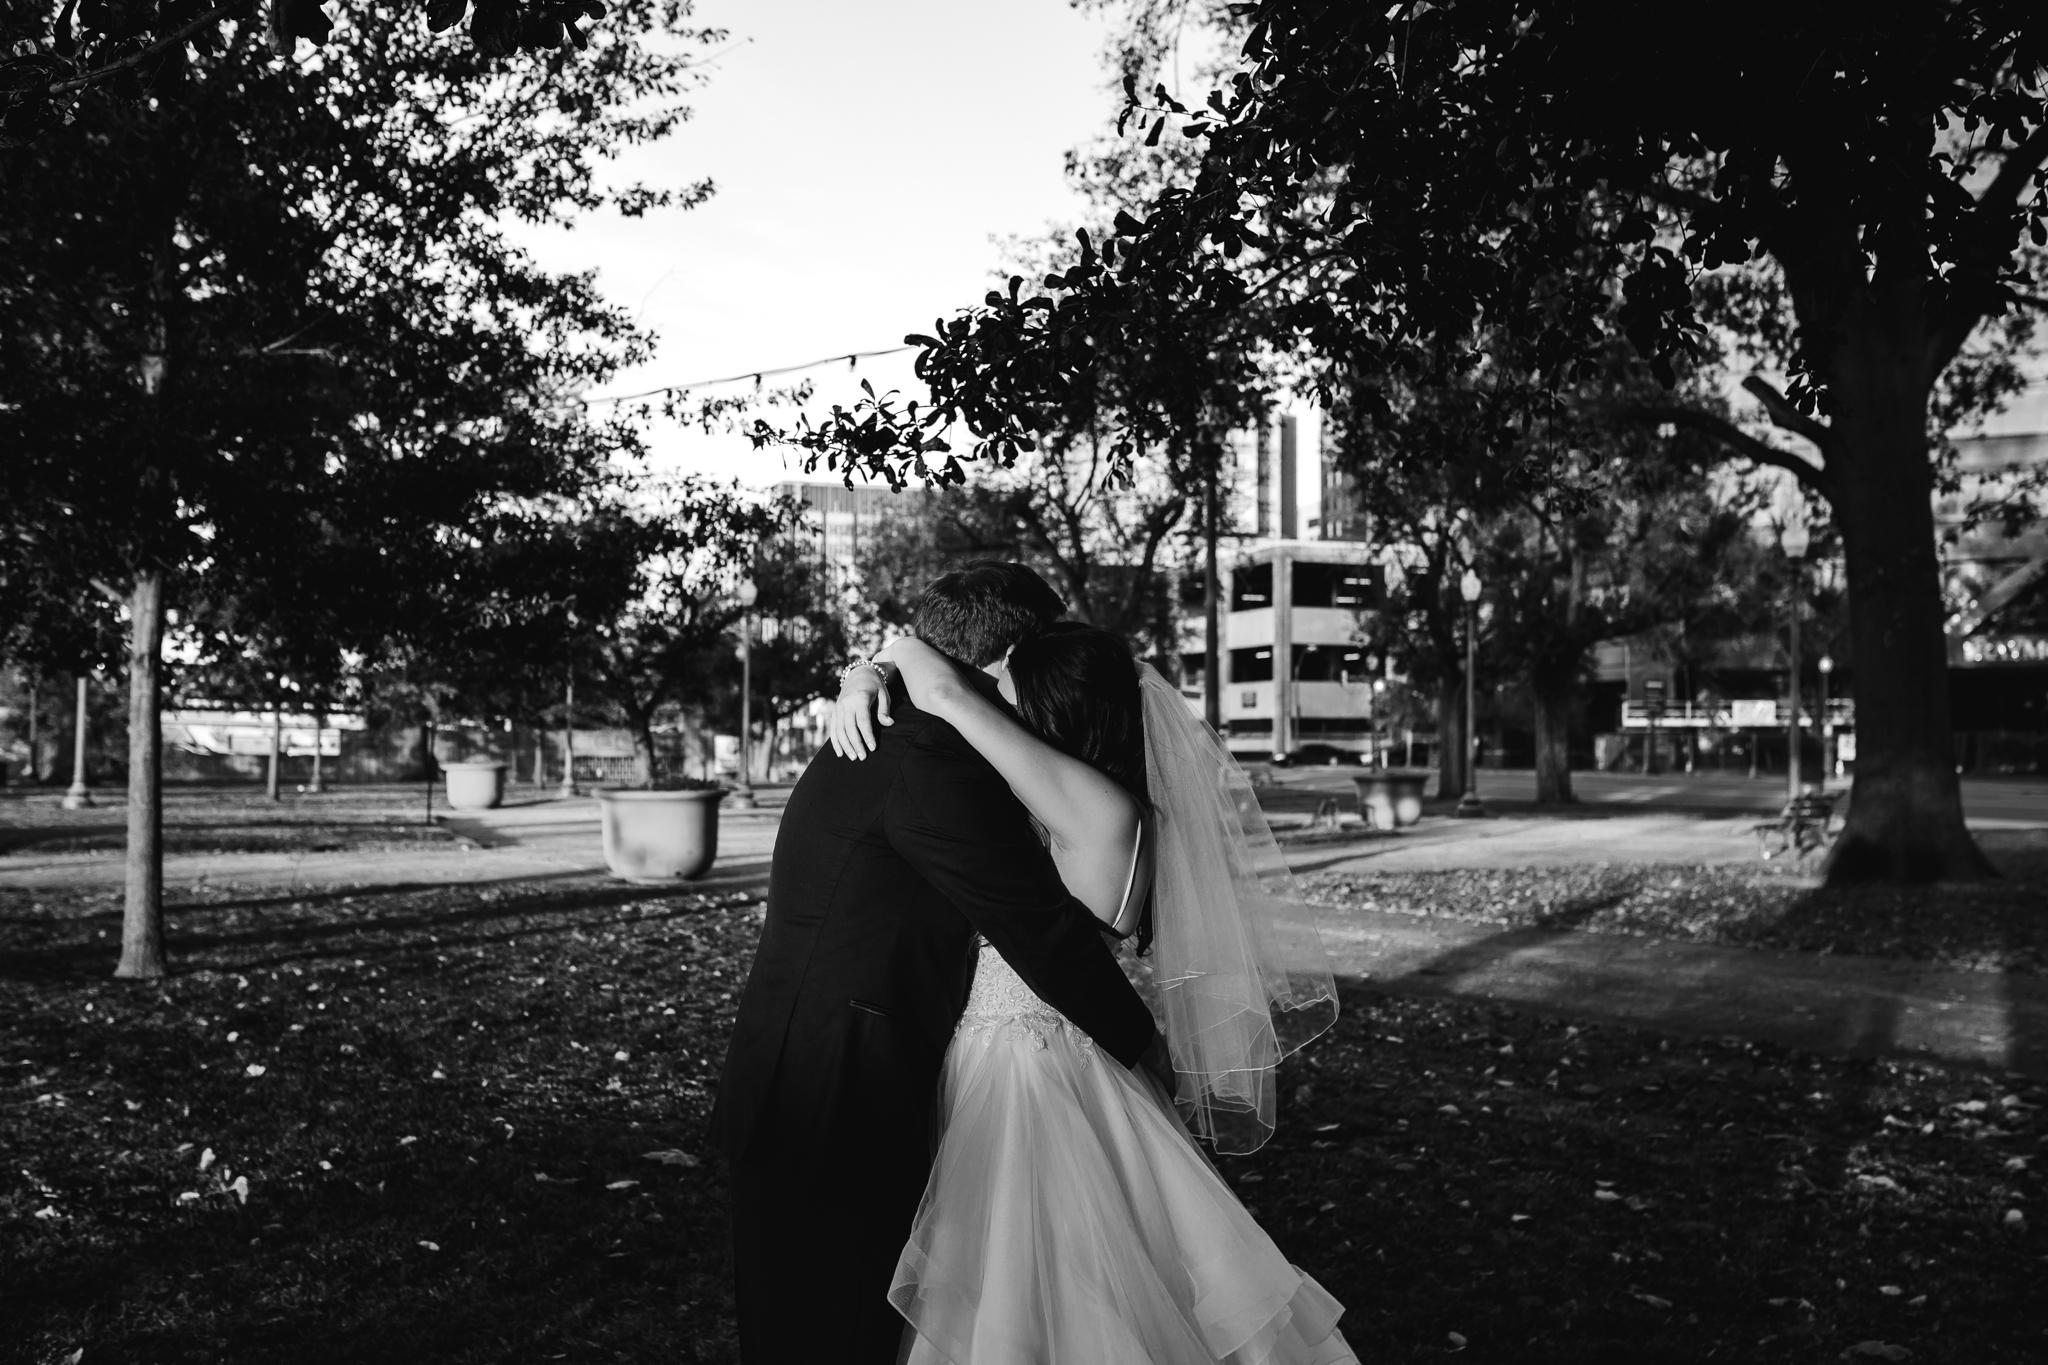 memphis-wedding-photographers-thewarmtharoundyou-ballinese-ballroom (19 of 65).jpg